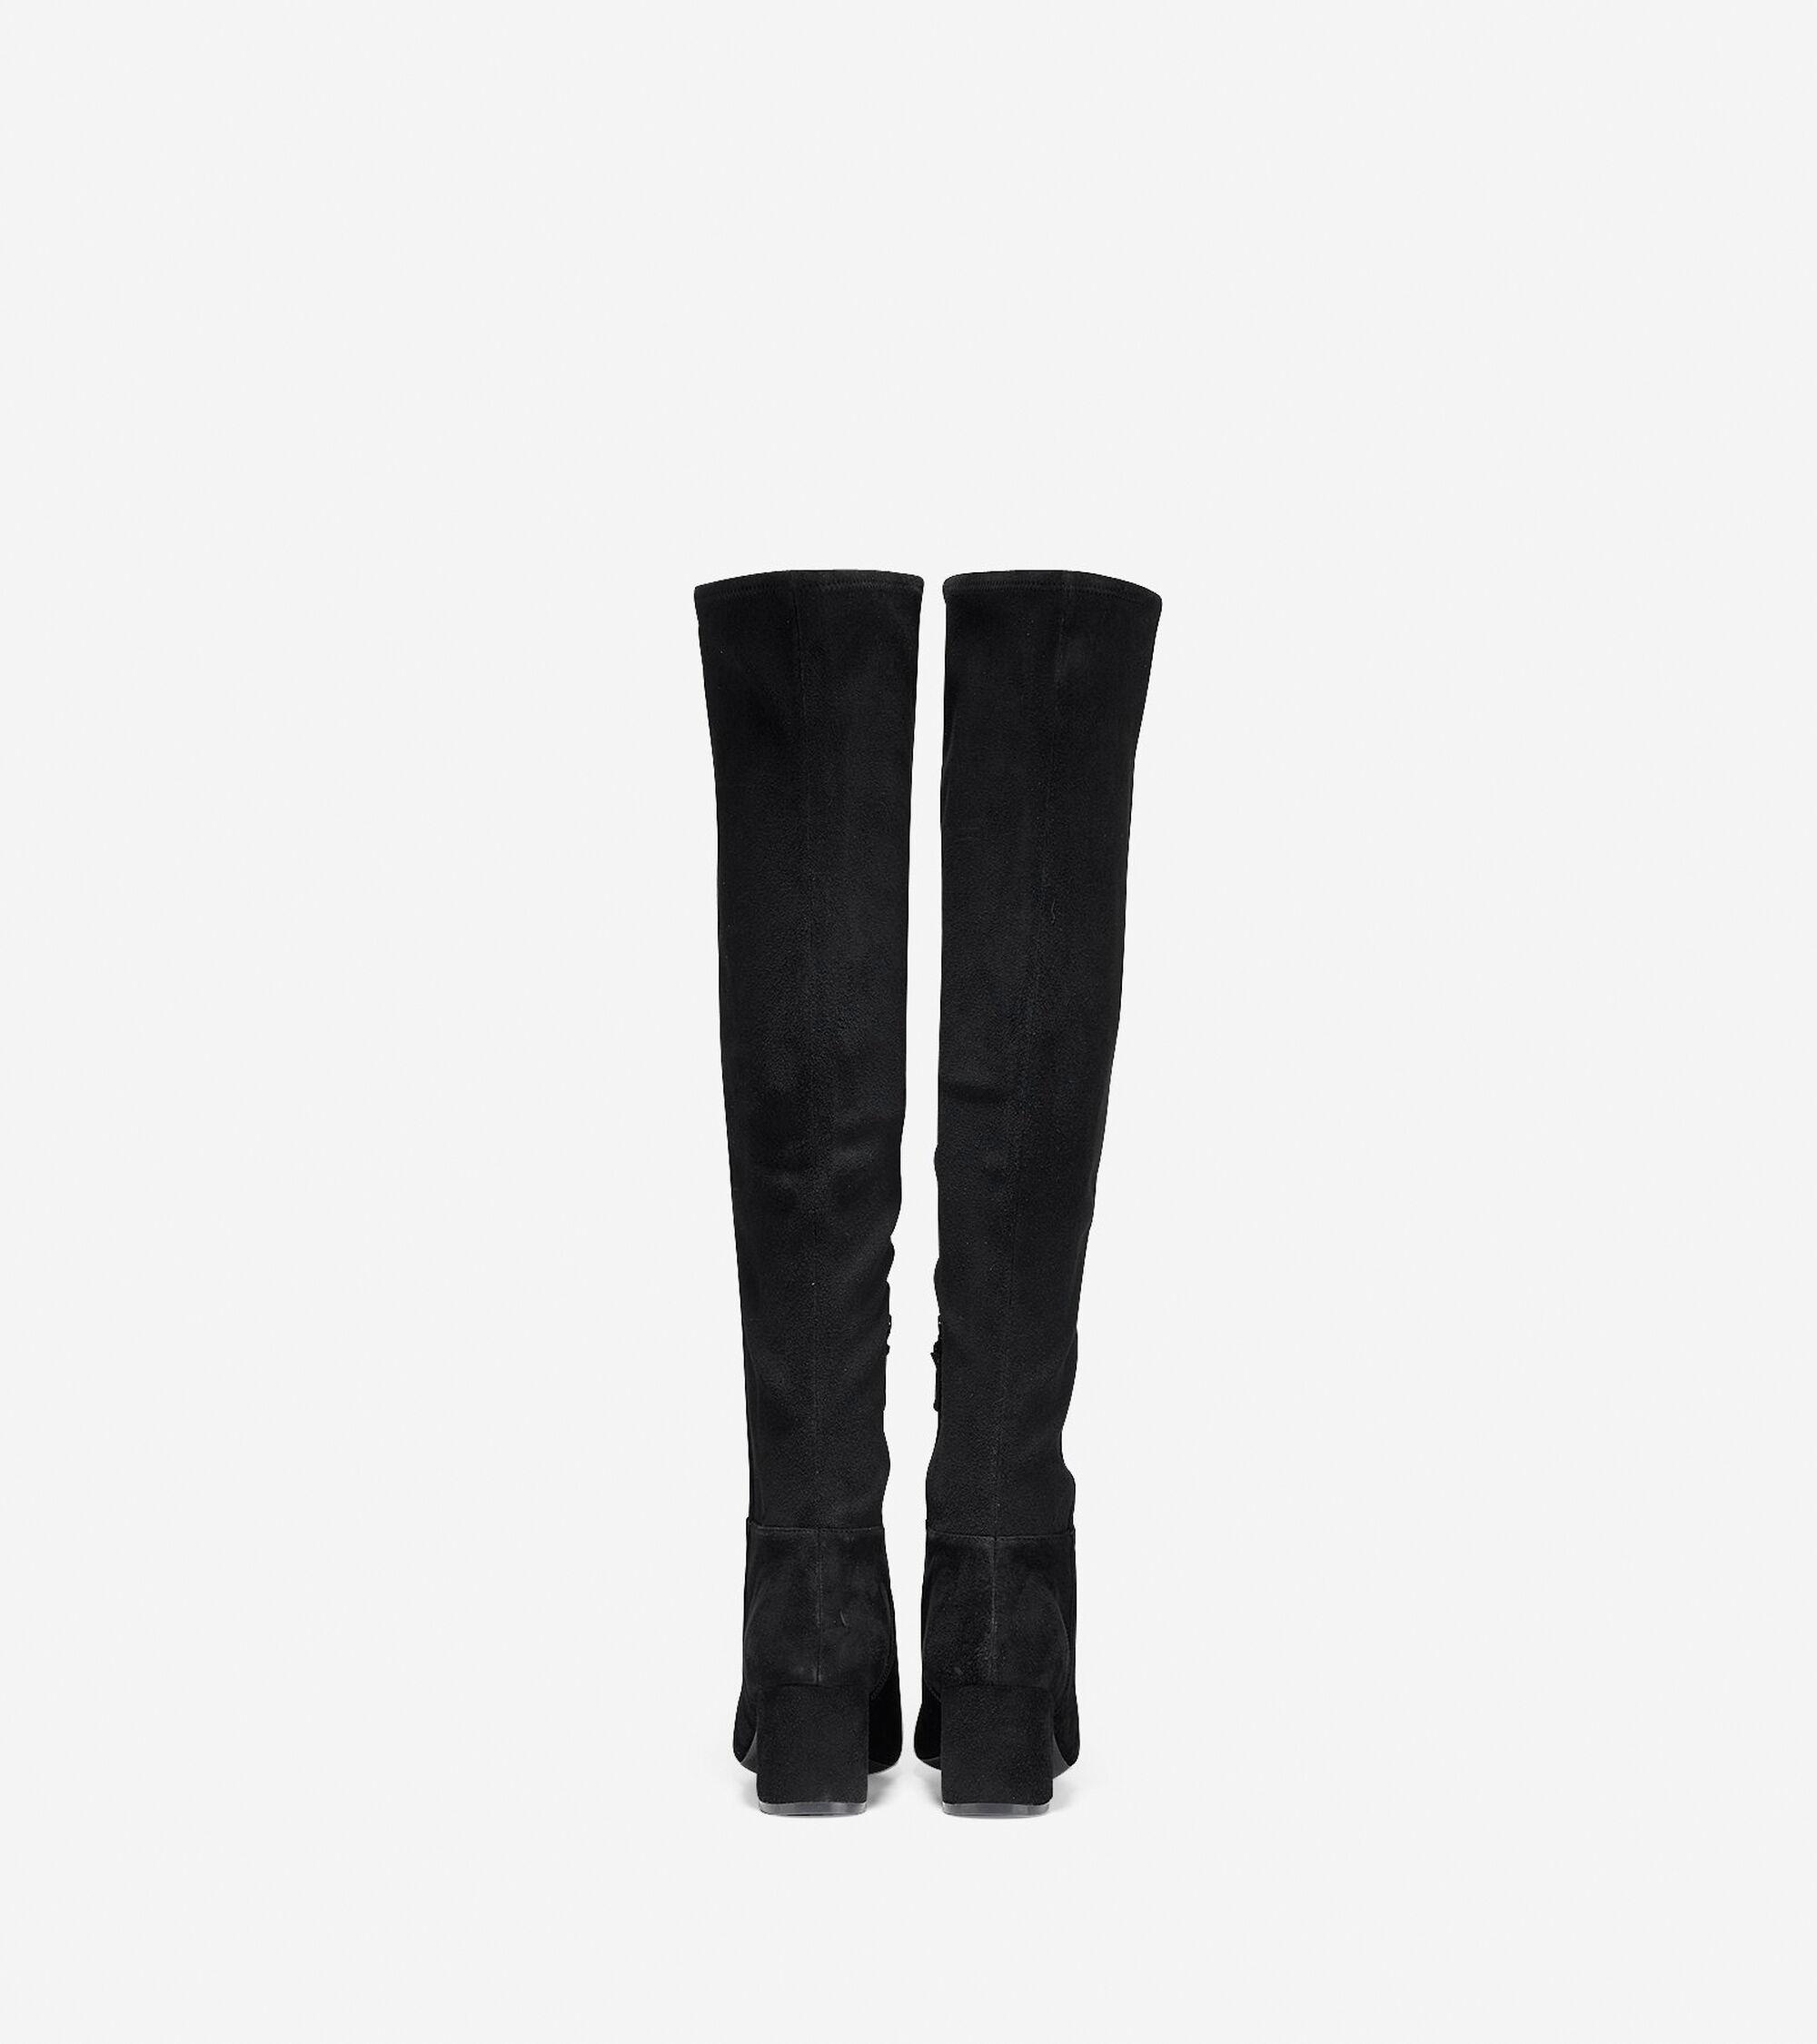 03fdaafd2a1 Women s Elnora Over The Knee Boots 60mm in Black